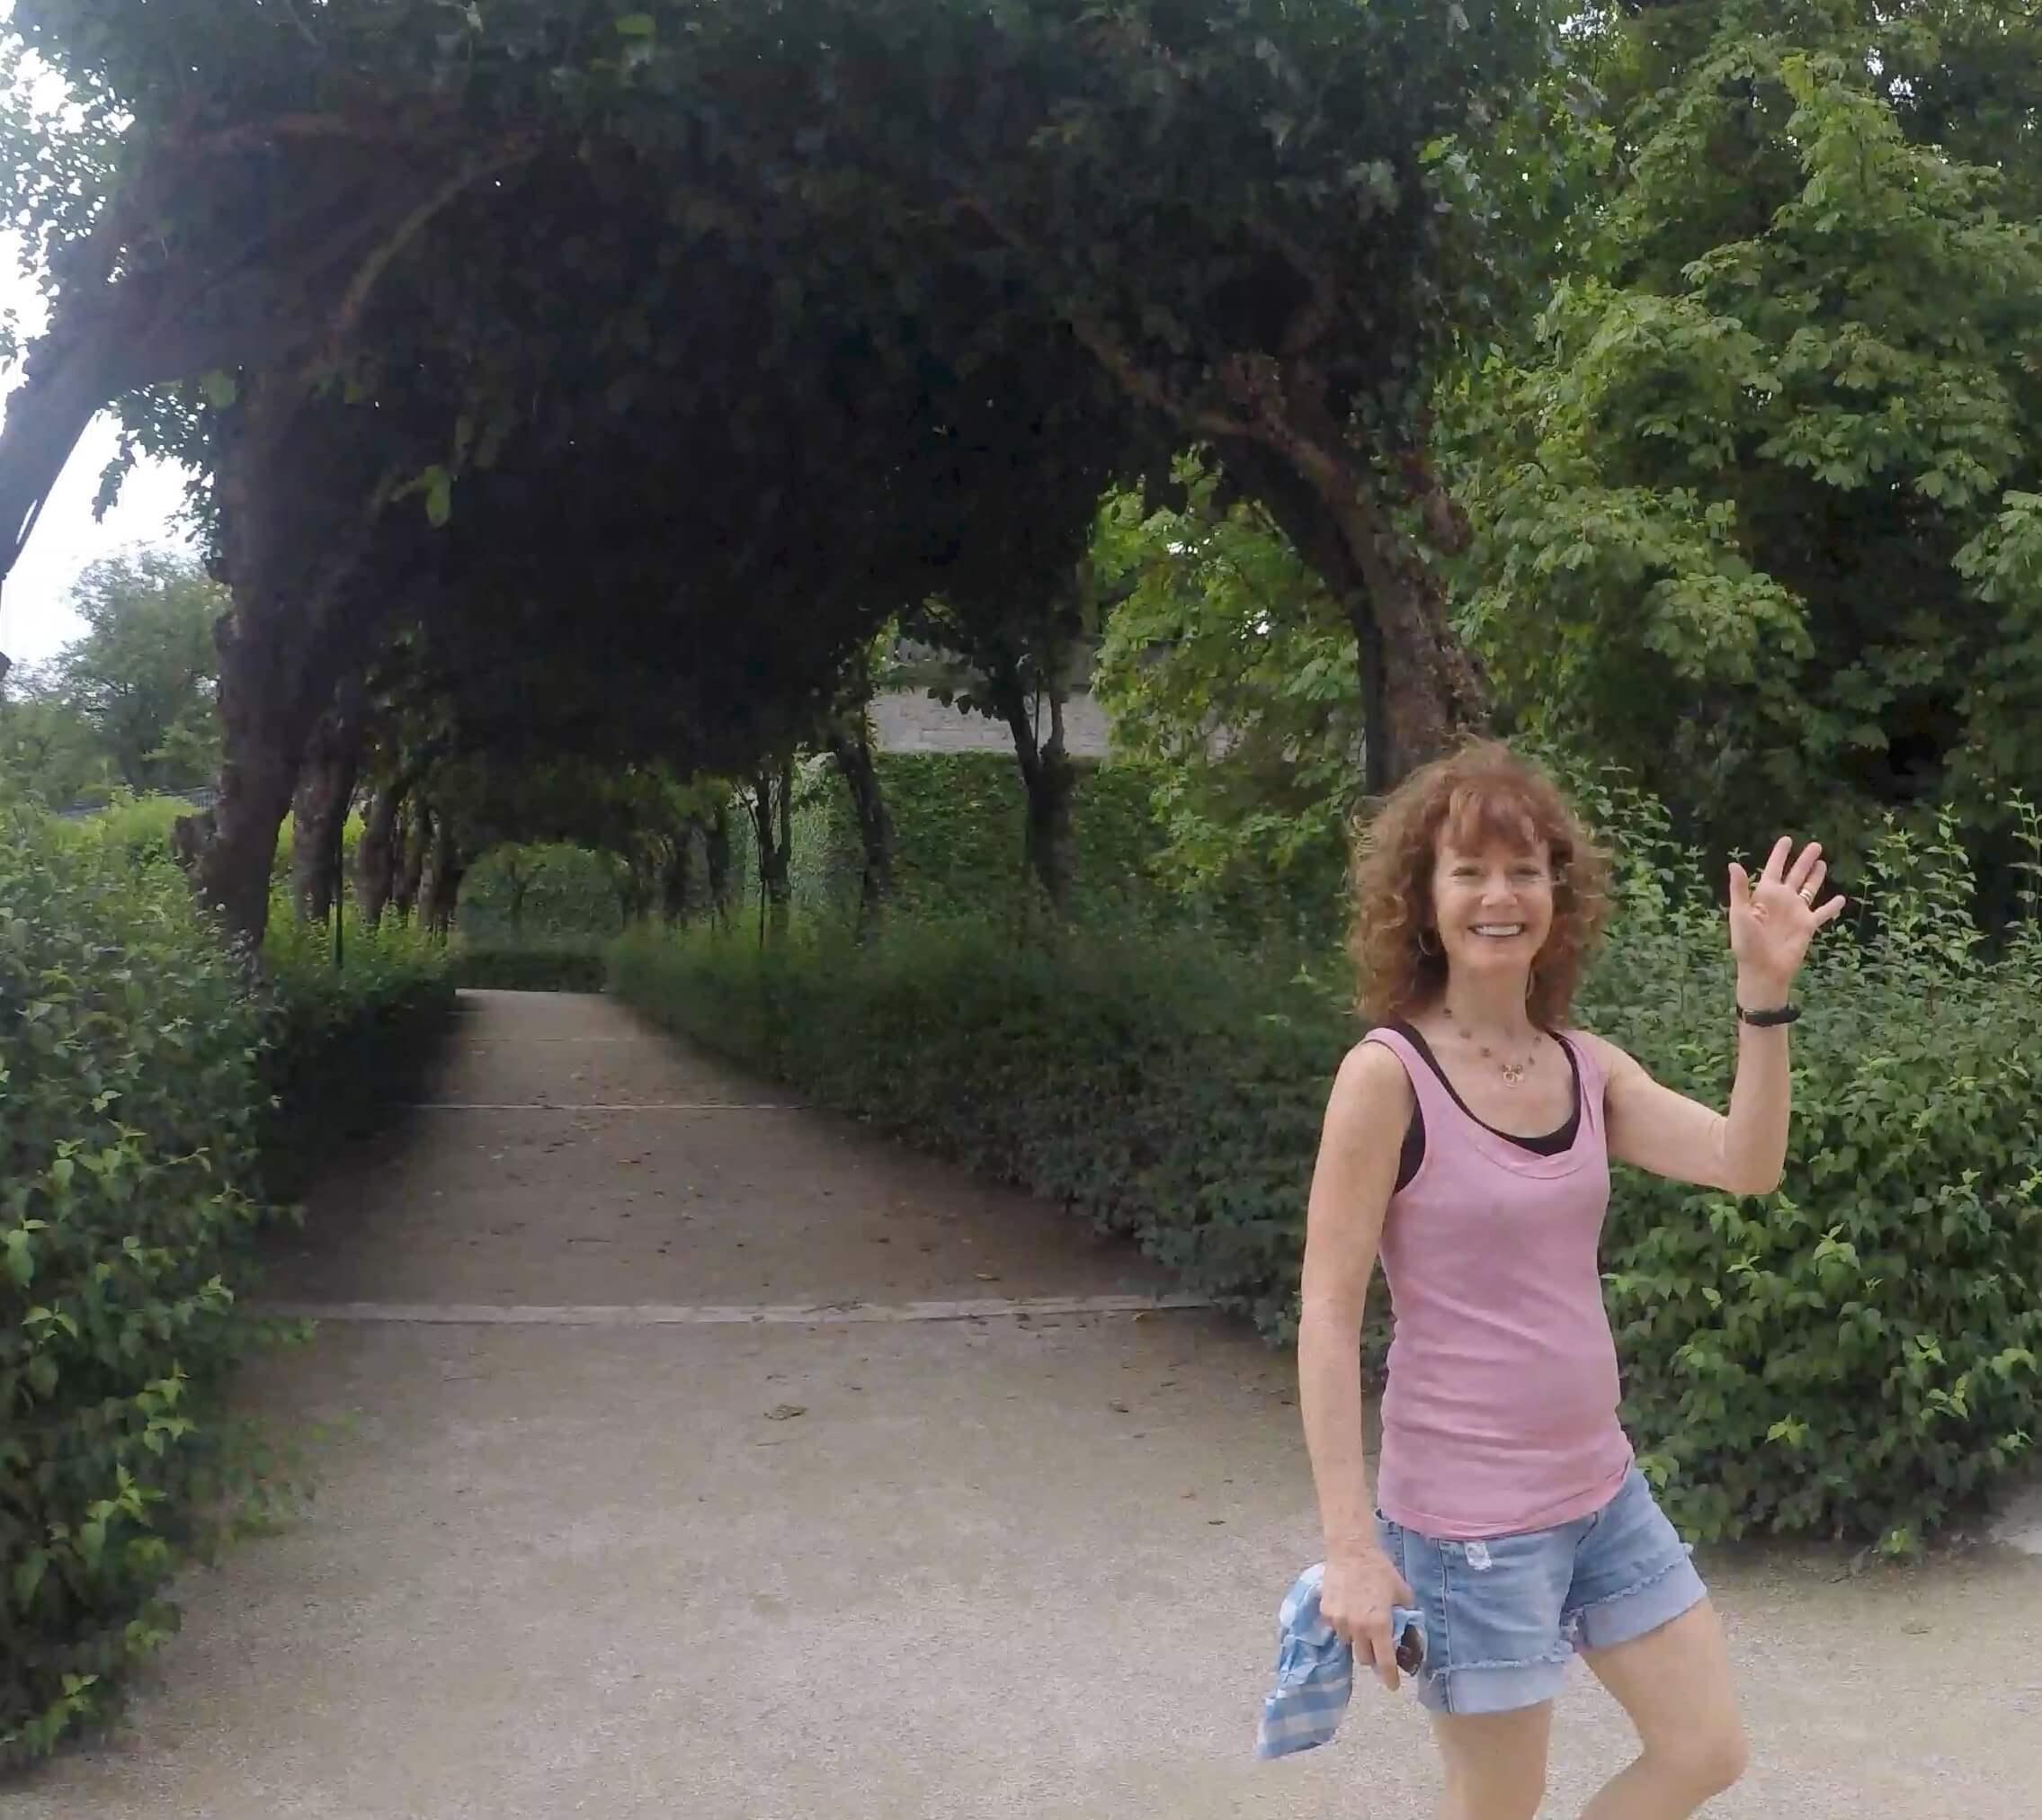 Rena in nature